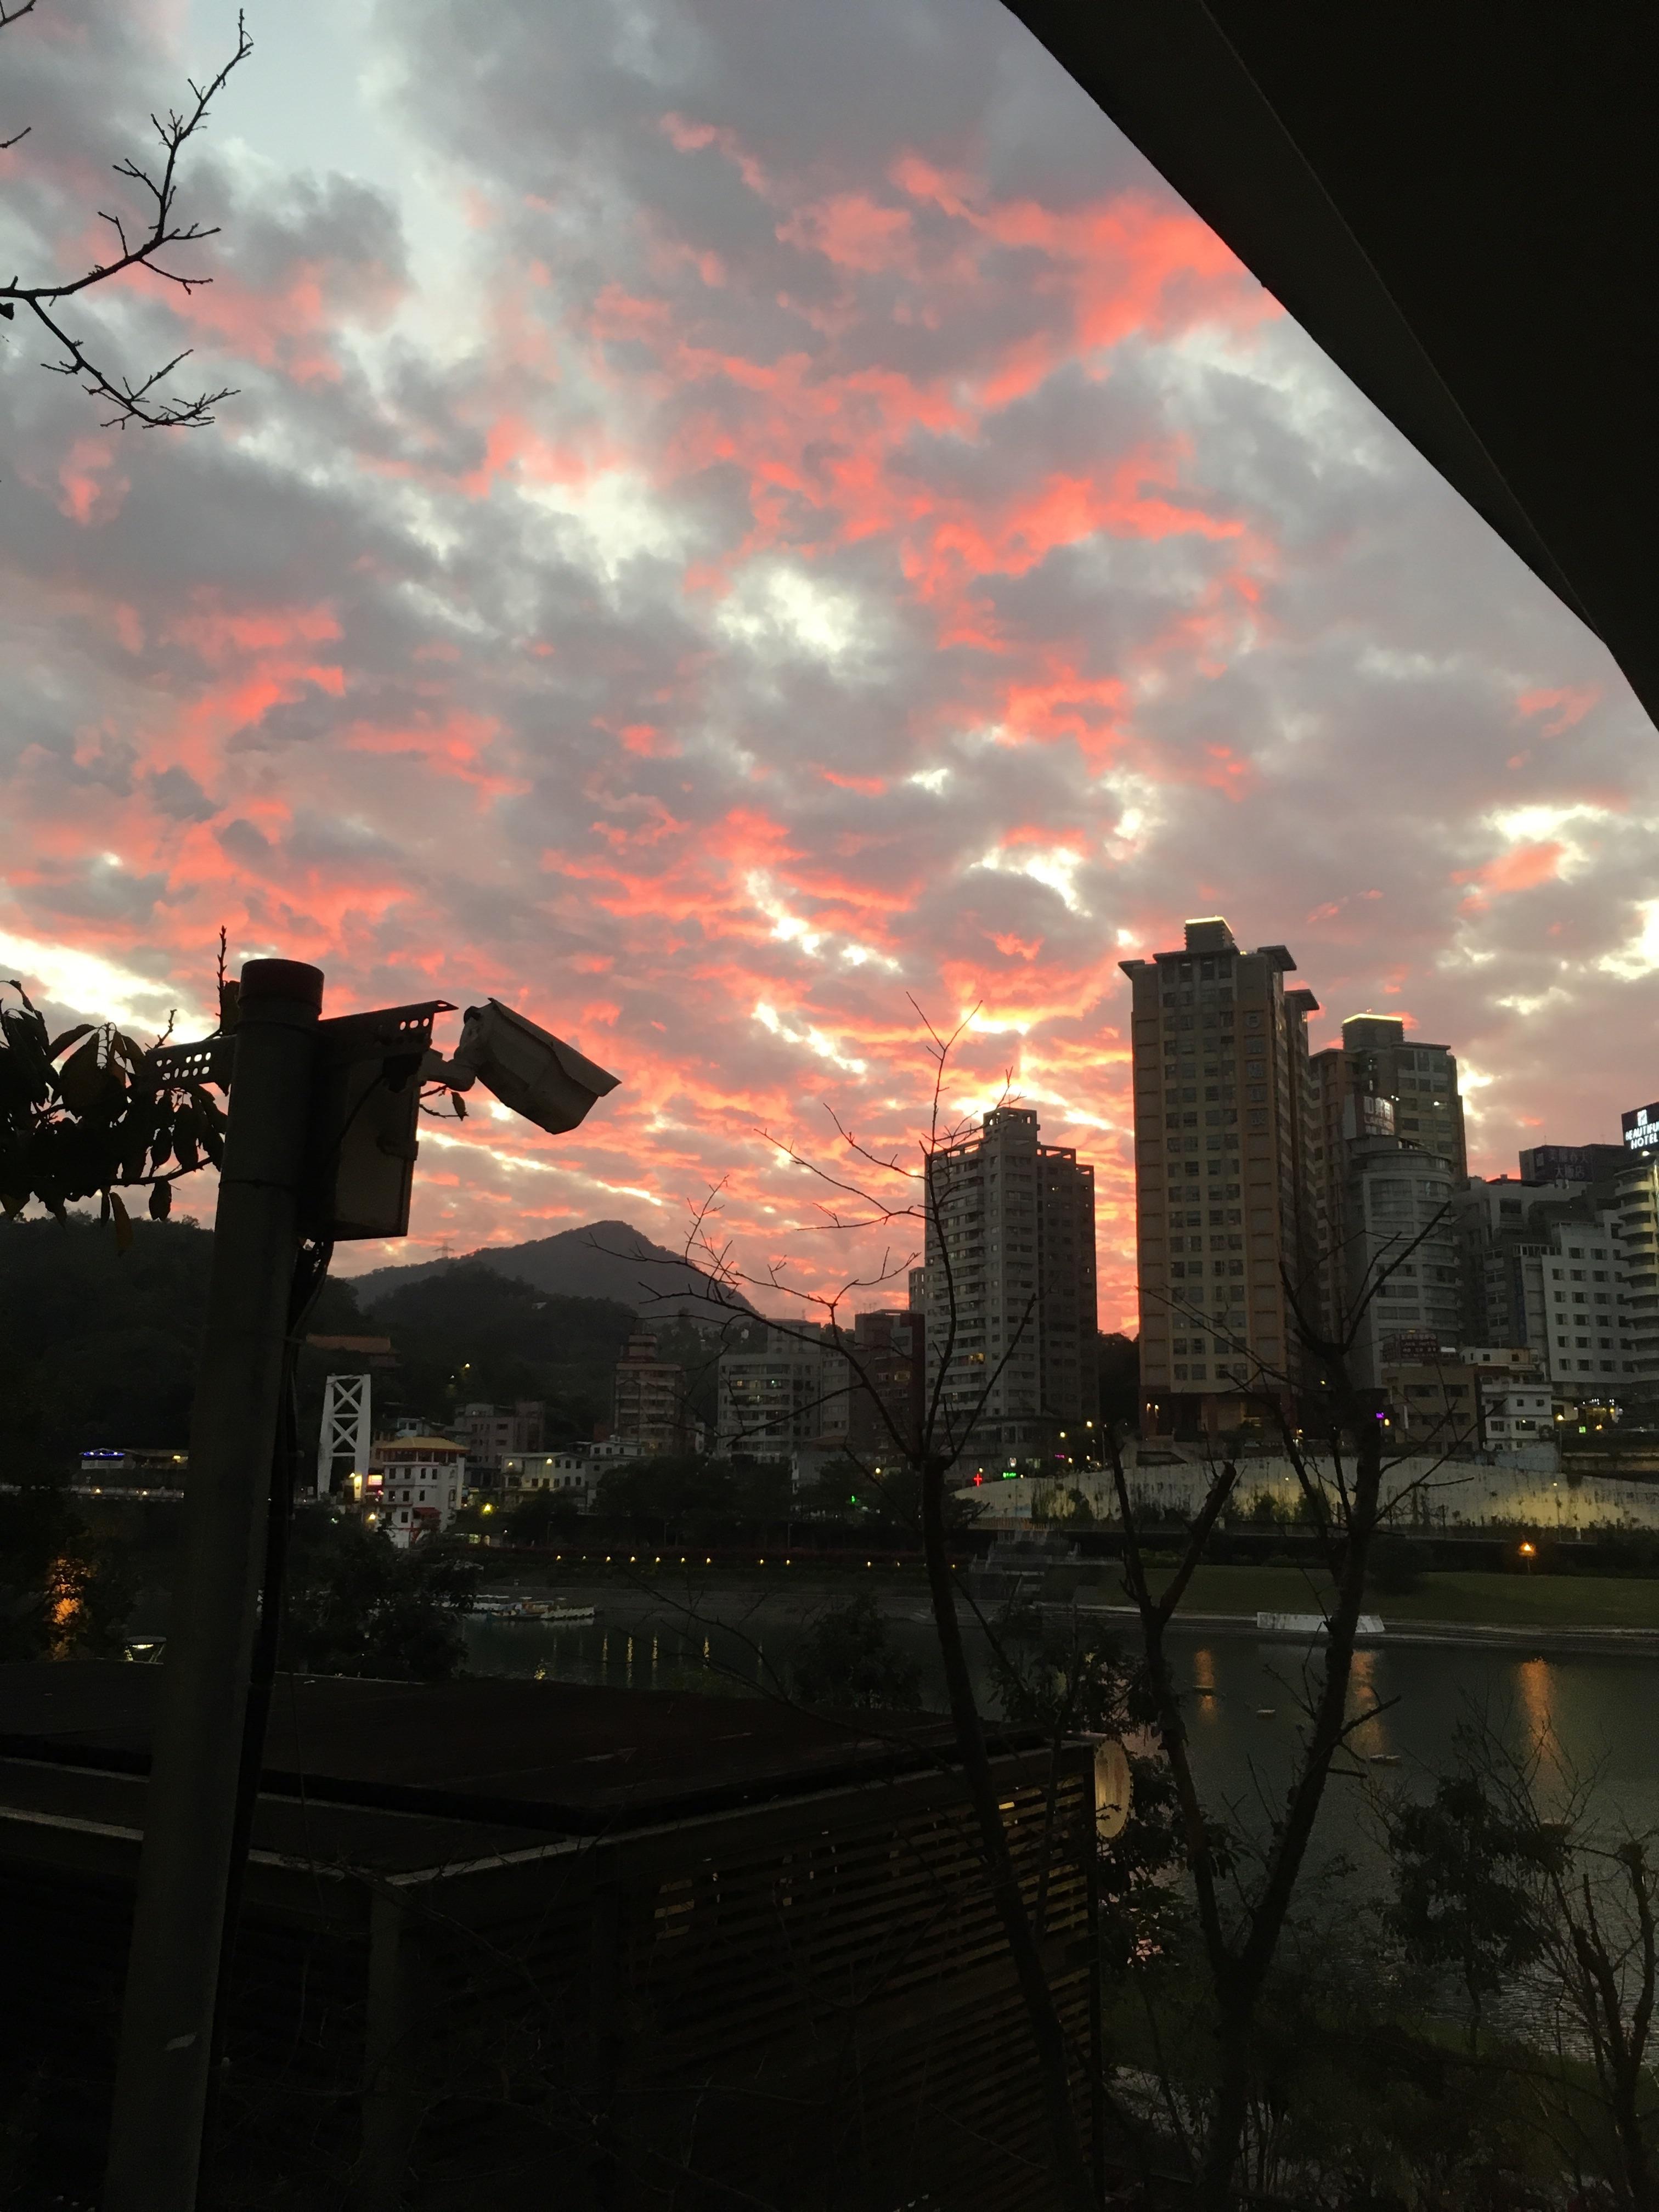 f:id:Hsiao-Jen:20181227154054j:image